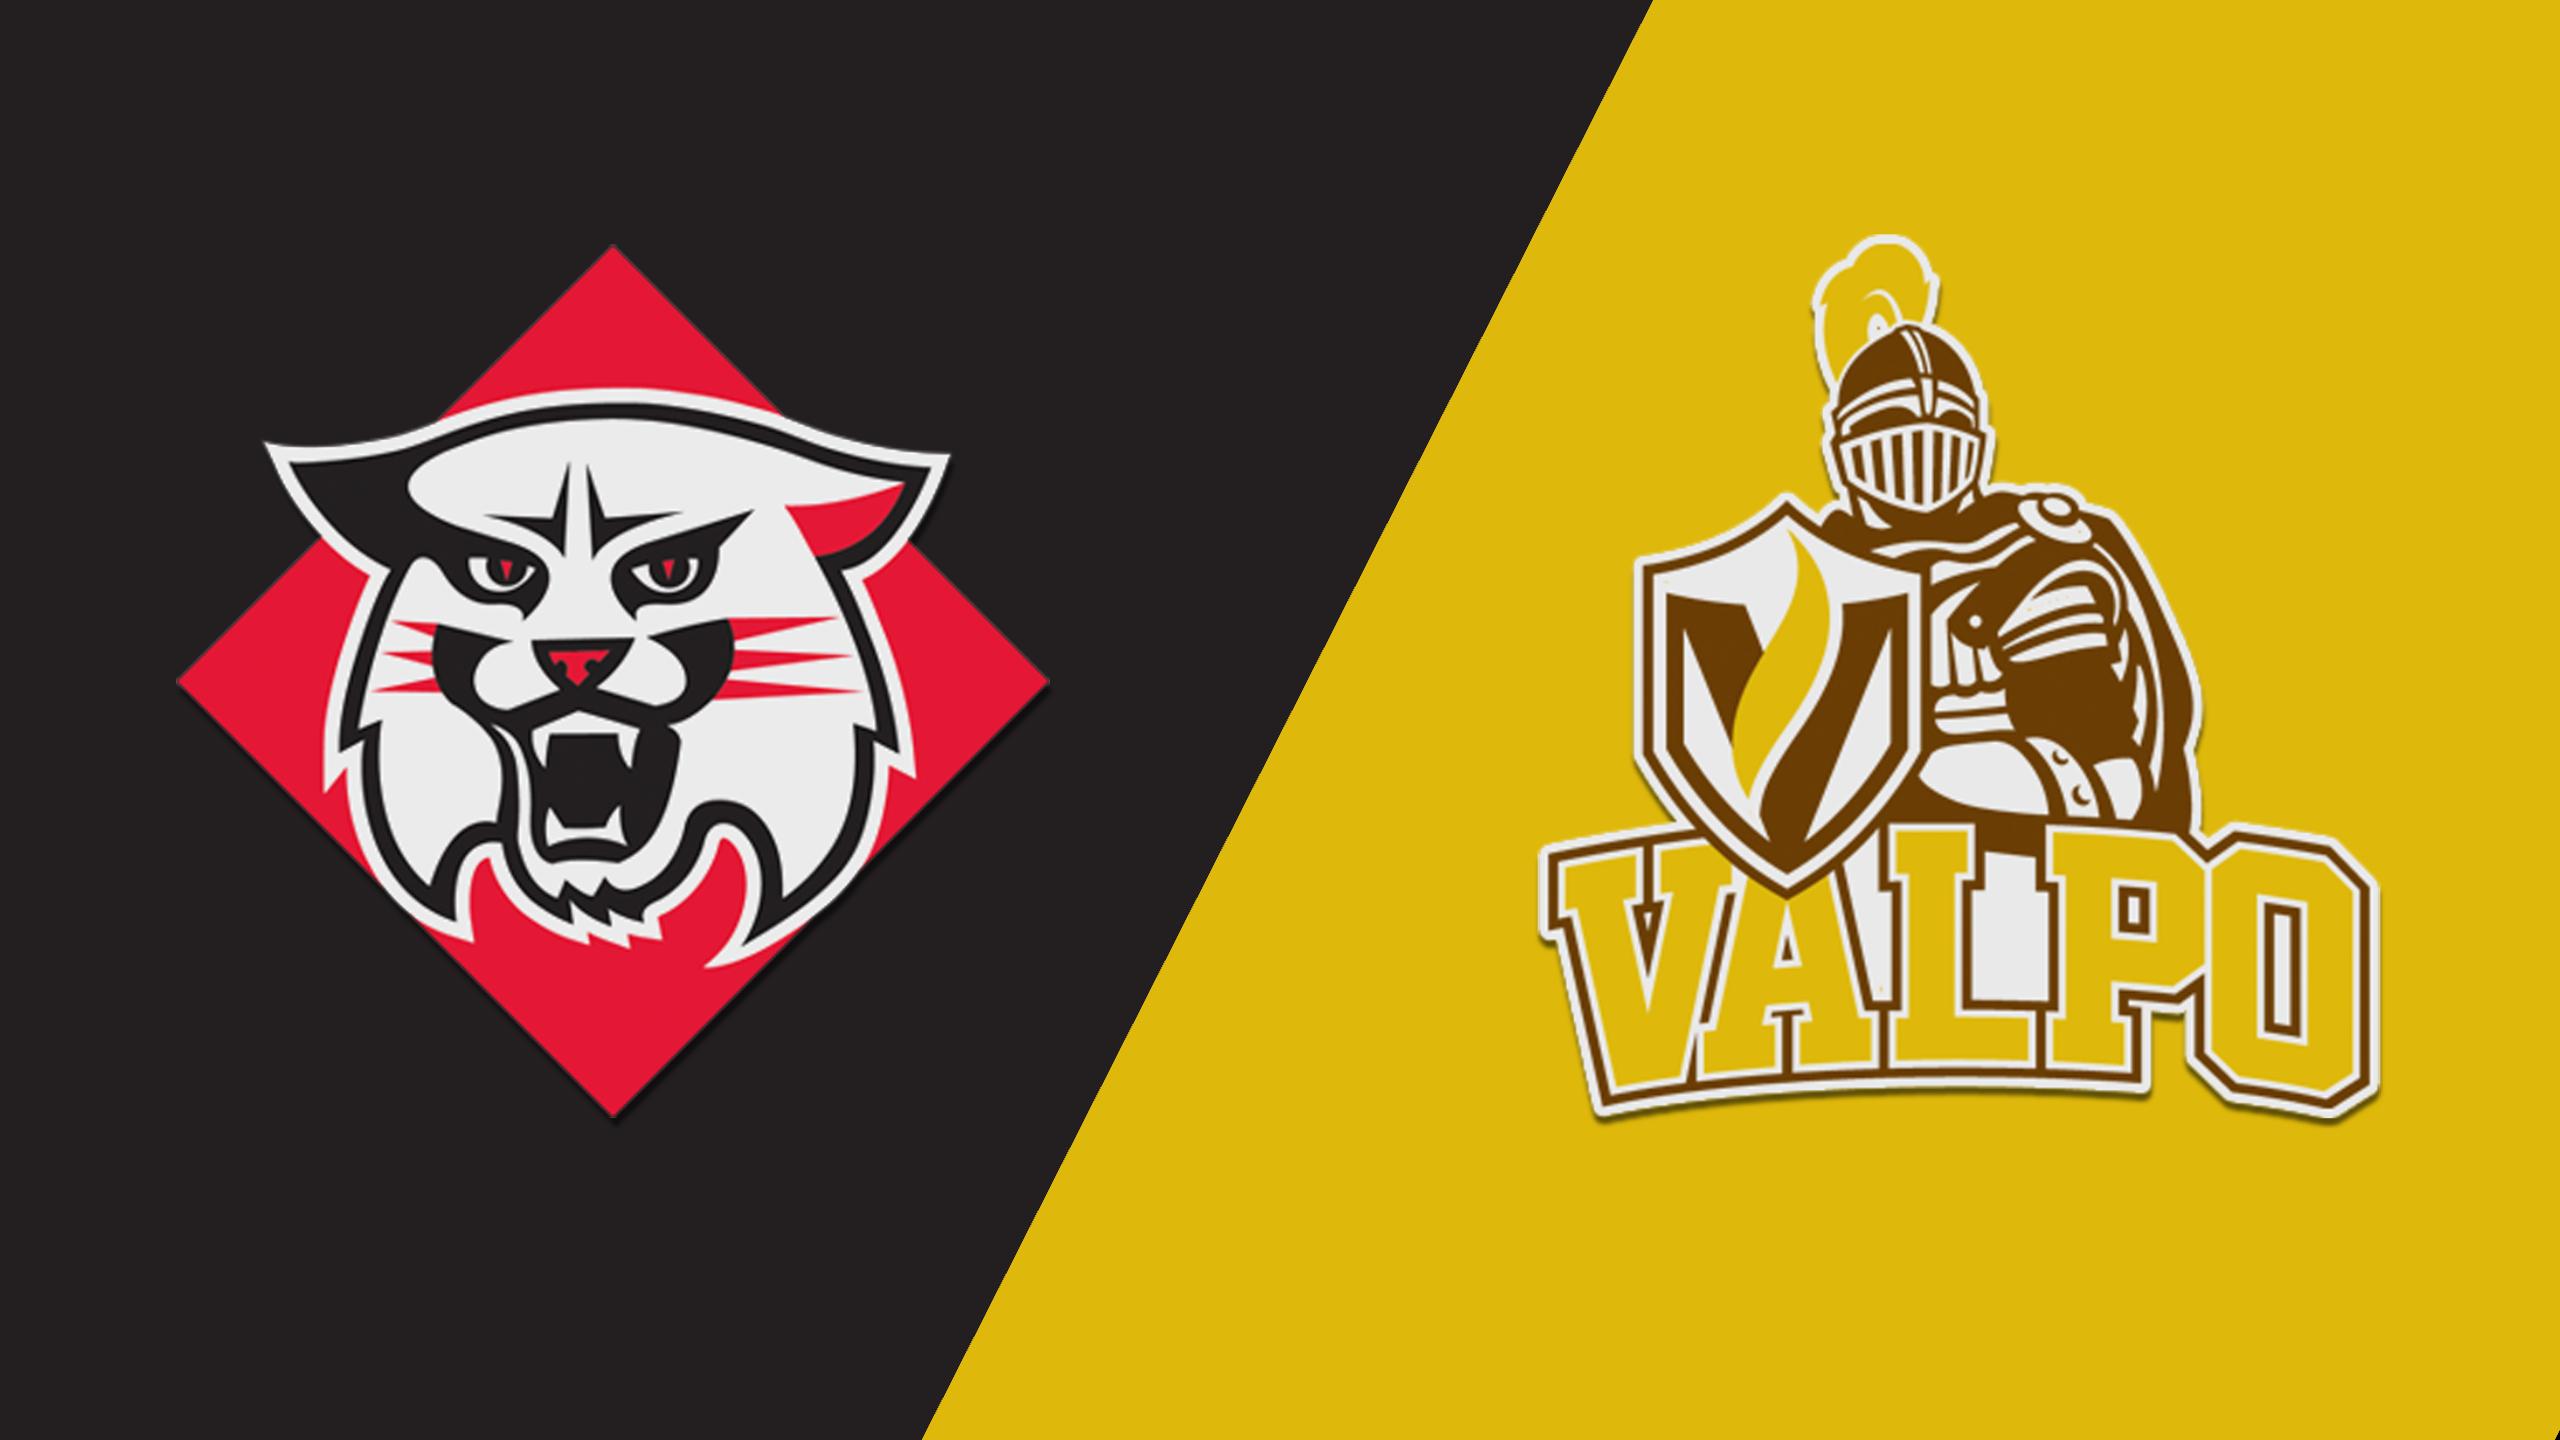 Davidson vs. Valparaiso (Football)